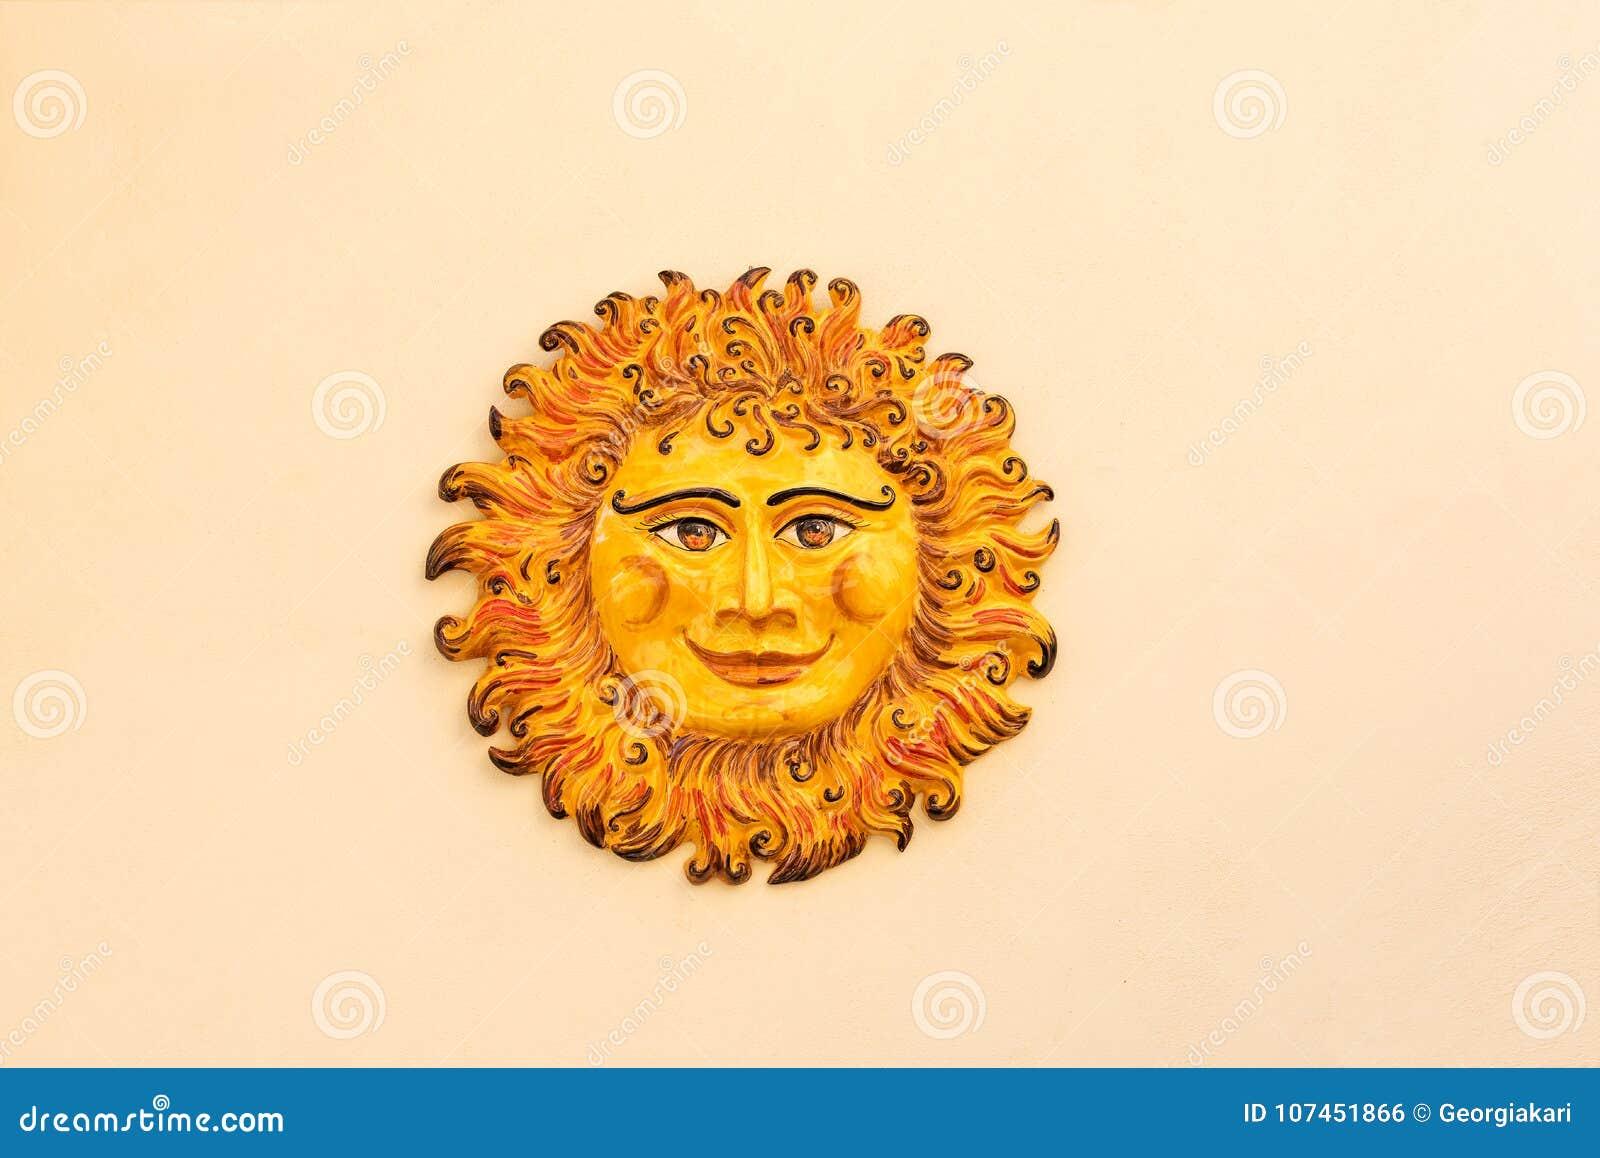 Ceramic sun stock photo. Image of decorative, design - 107451866